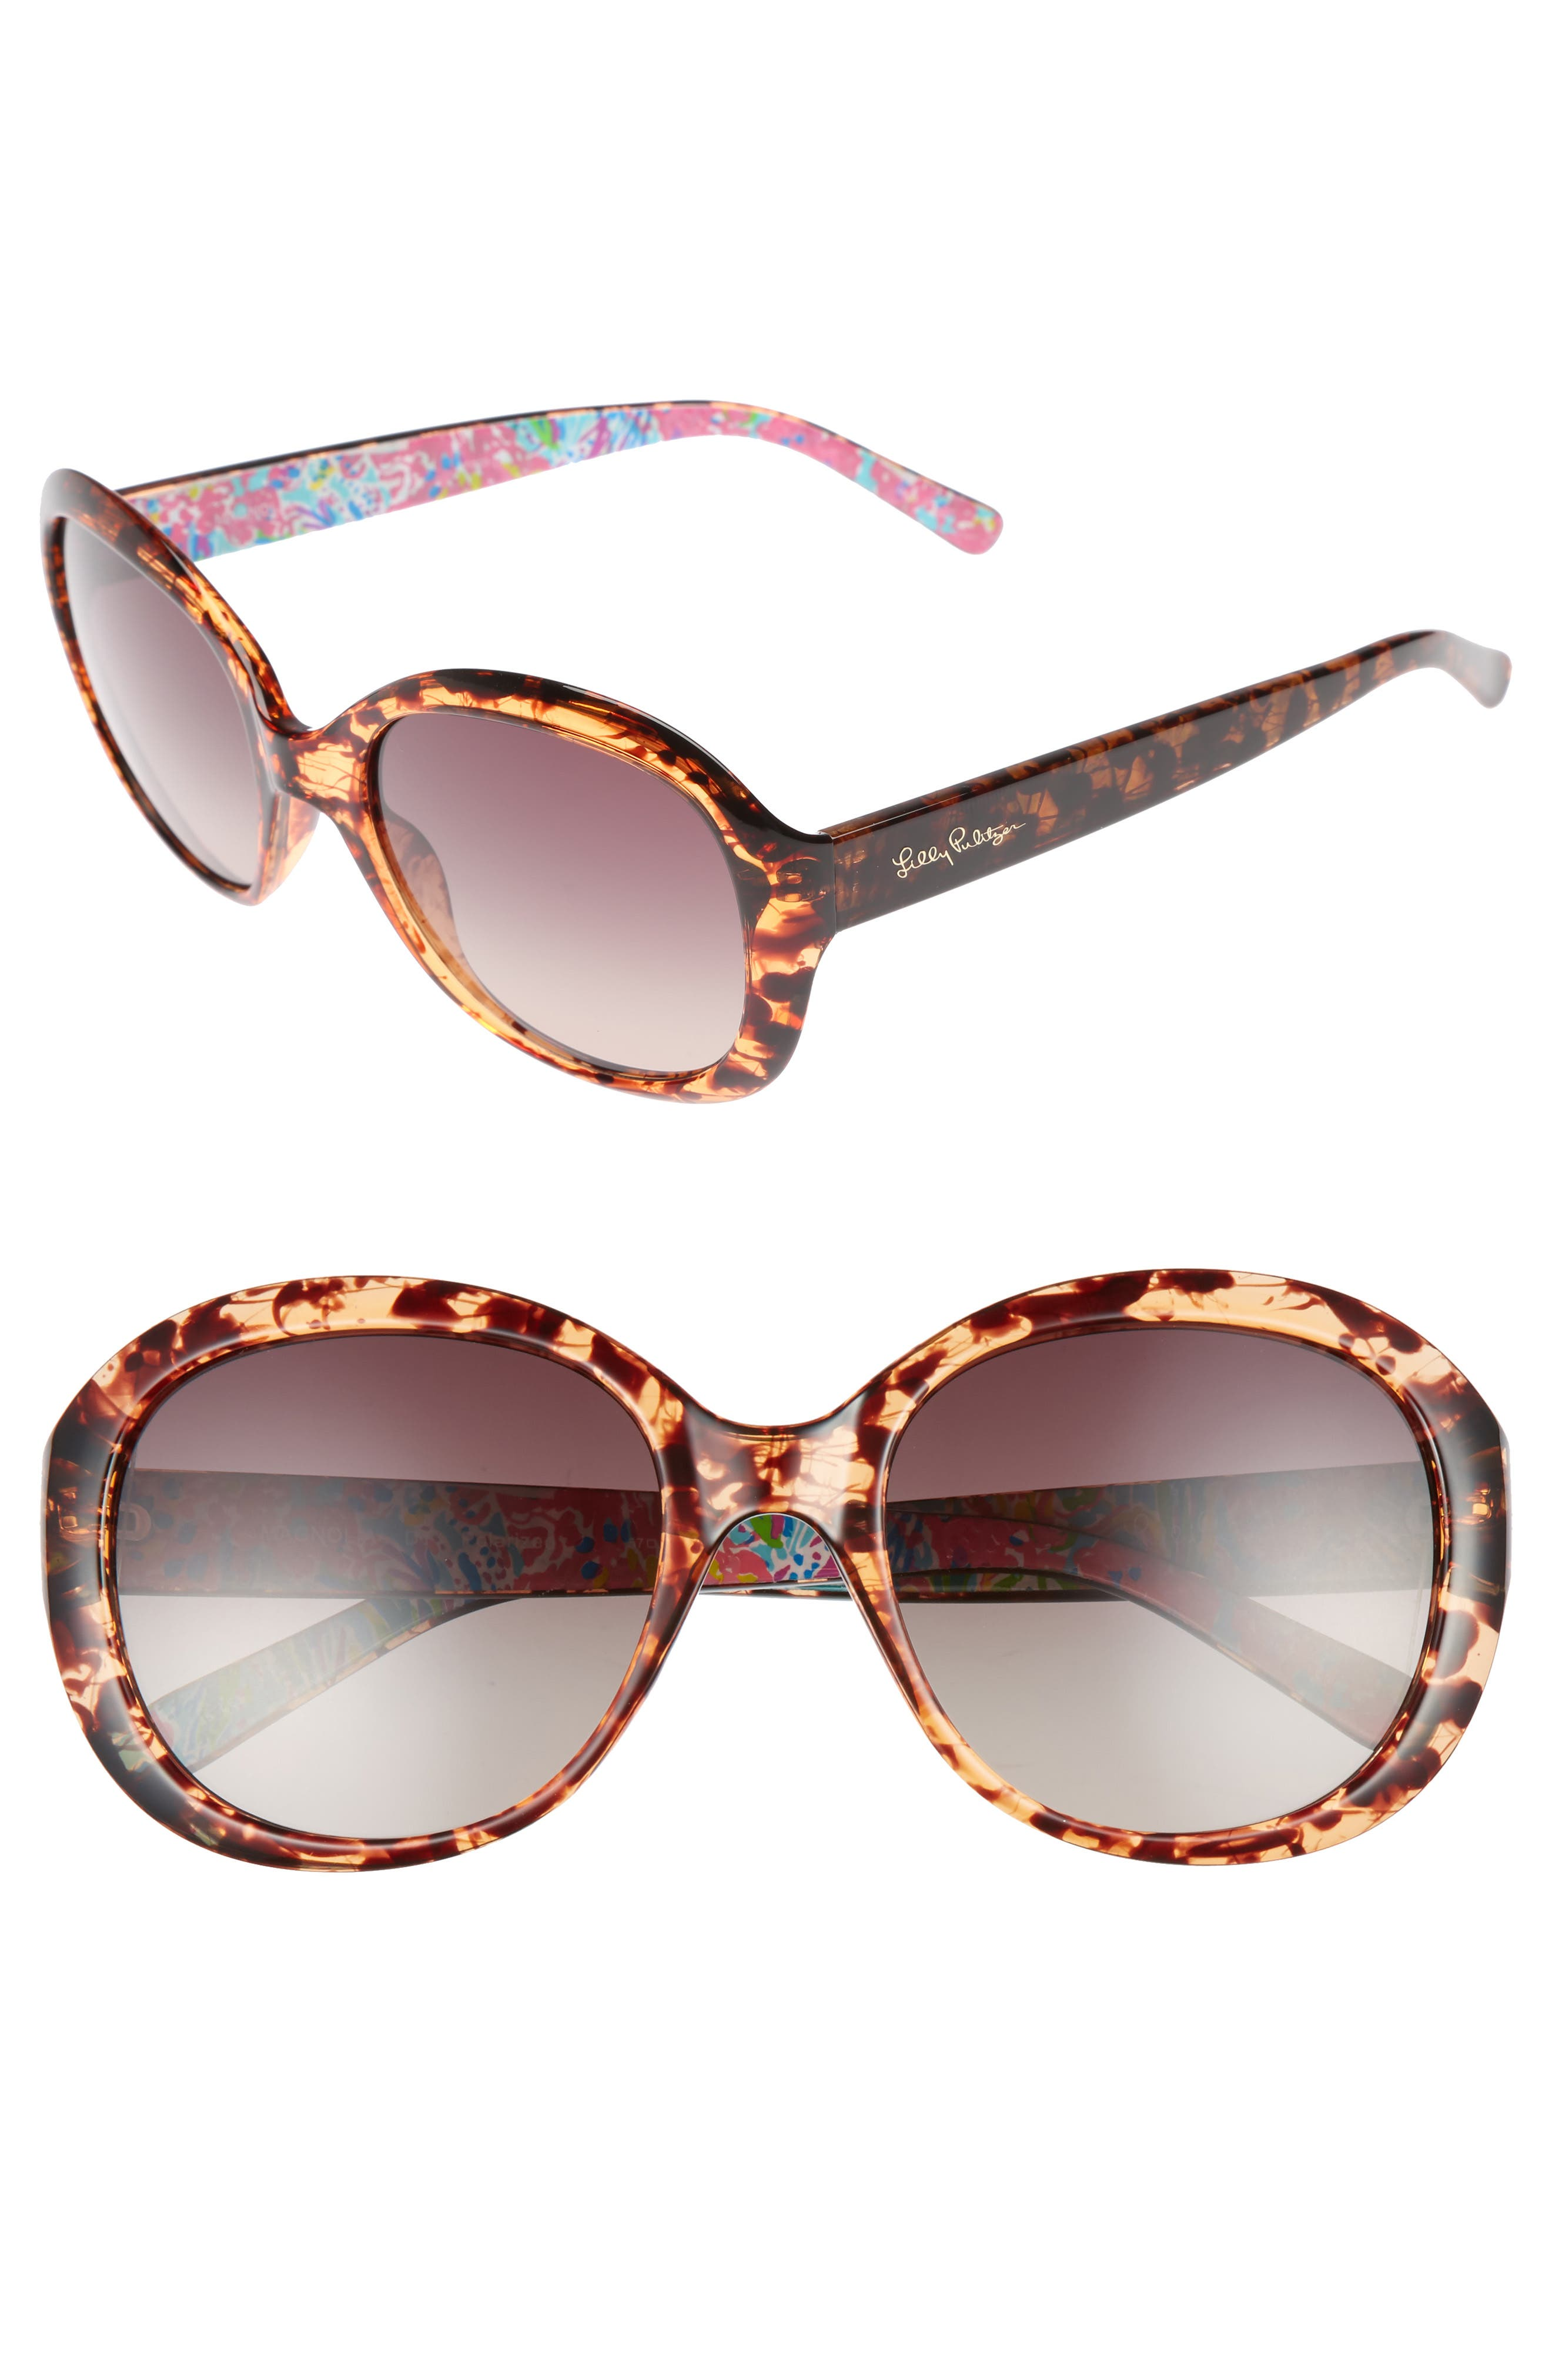 Magnolia 57mm Polarized Round Sunglasses,                         Main,                         color, Havana